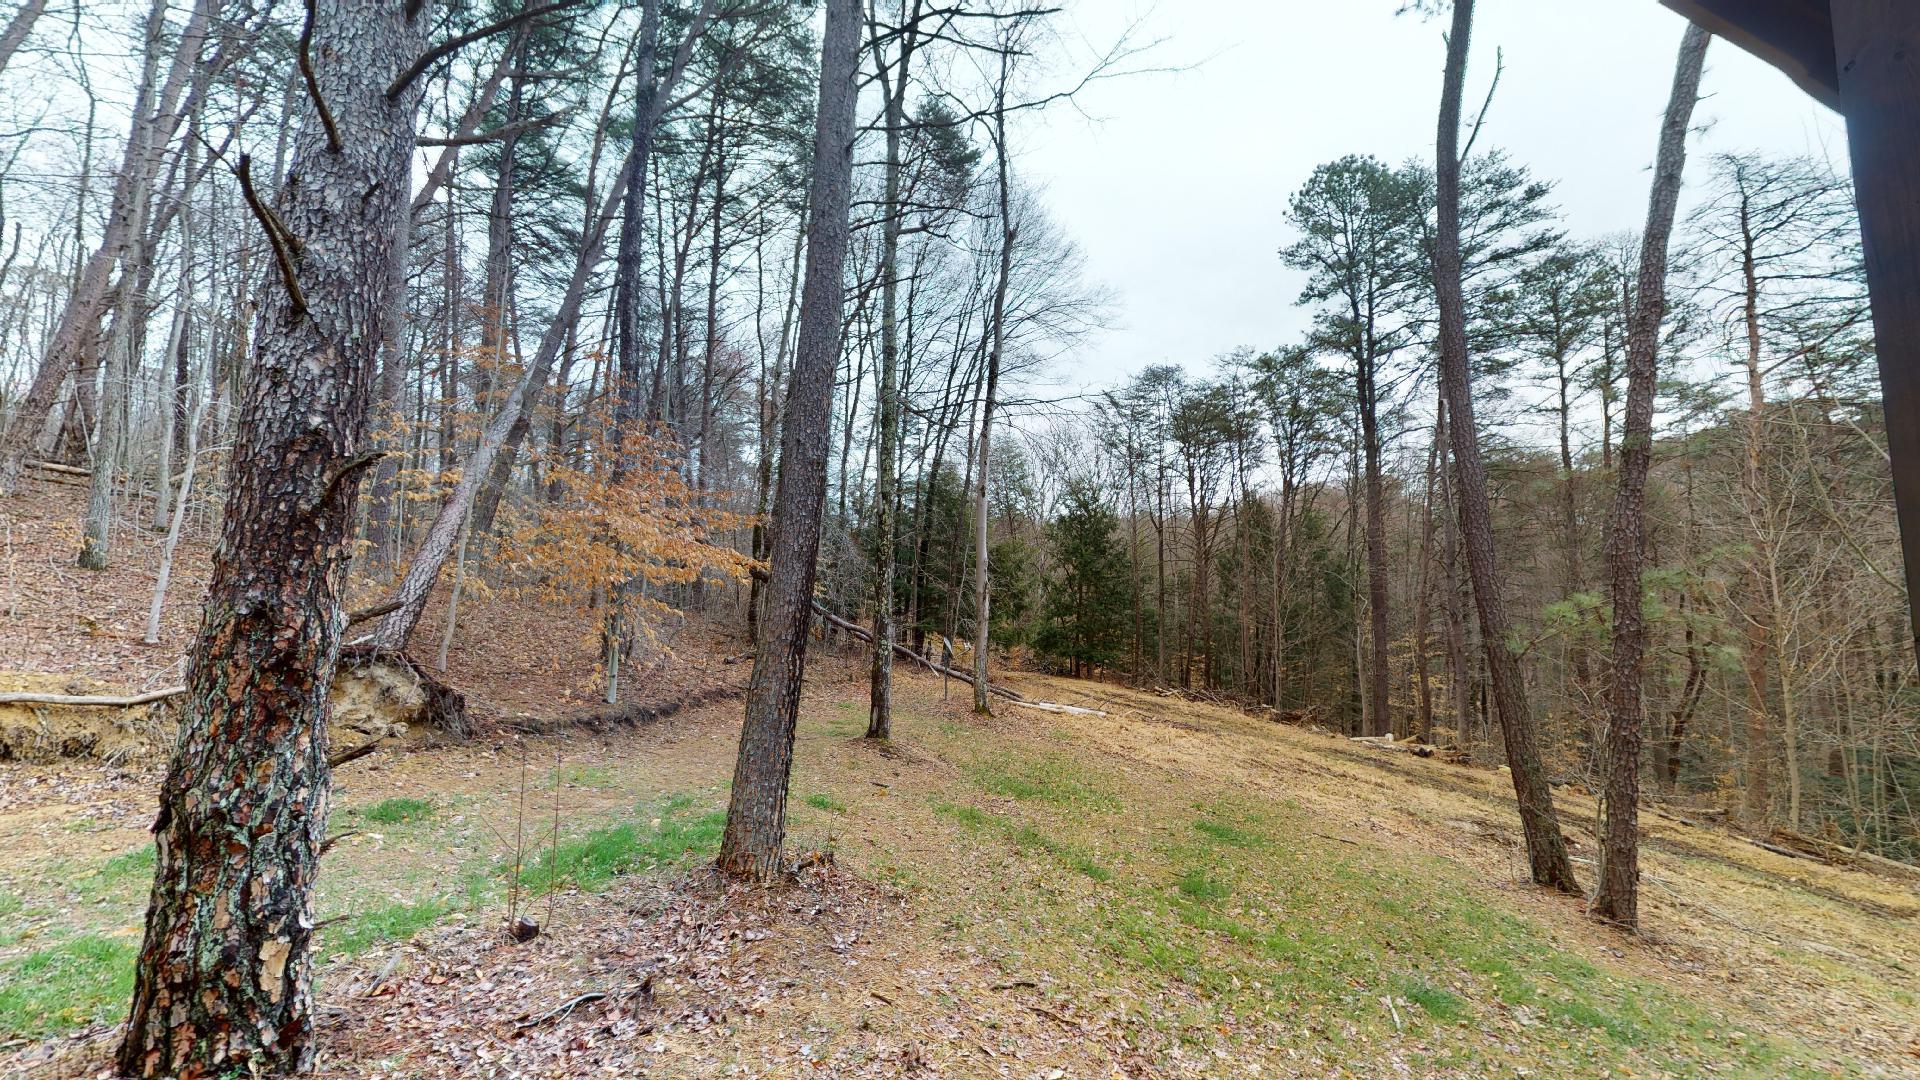 Trail Ridge View - View from Trail Ridge